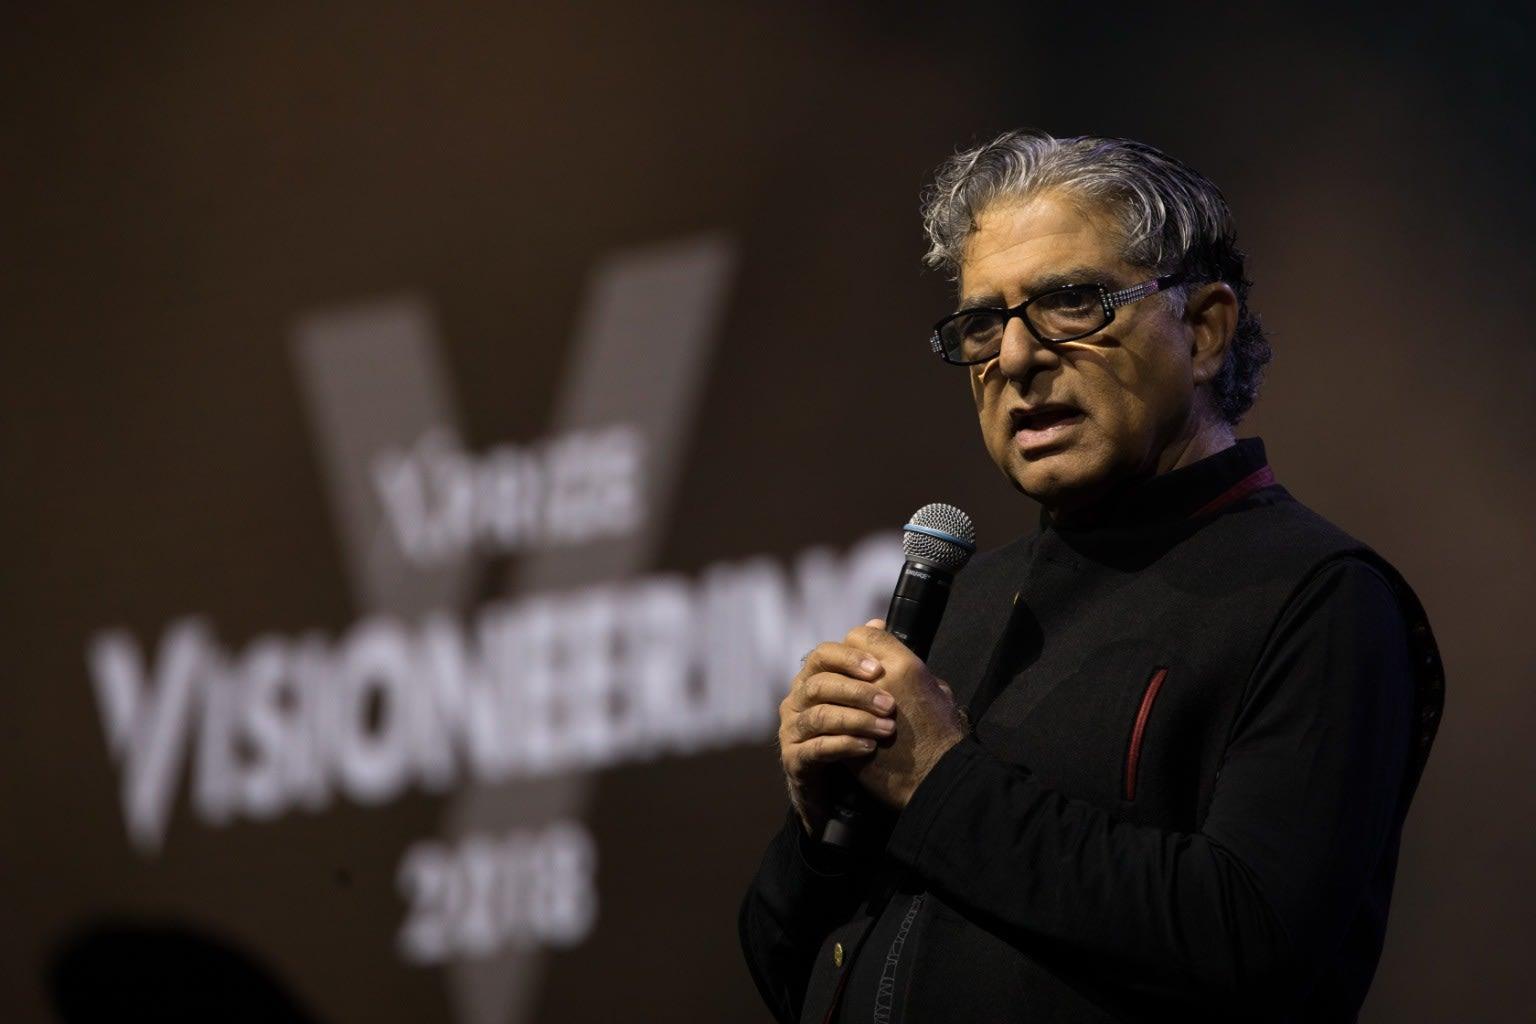 Deepak Chopra on stage